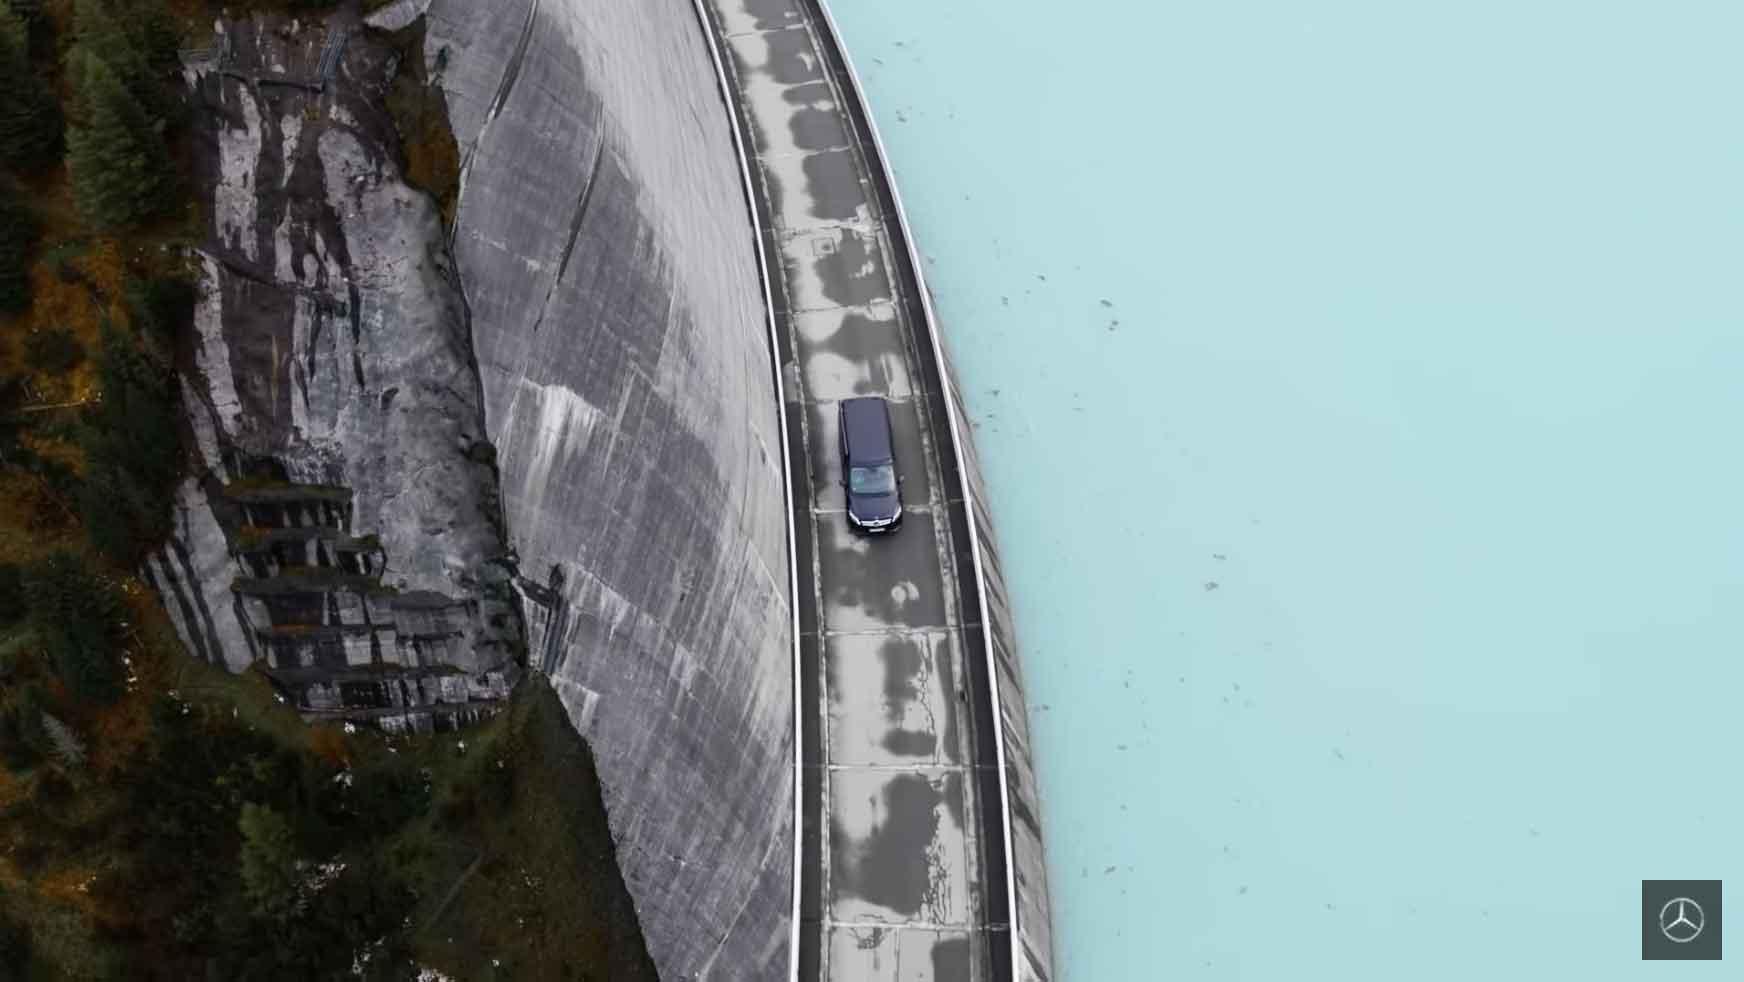 Drohne Silvretta Montafon Österreich - Mercedes Marco Polo - VR-COPTER – AERIAL DRONE FILMING BY JOCHEN RIEHM